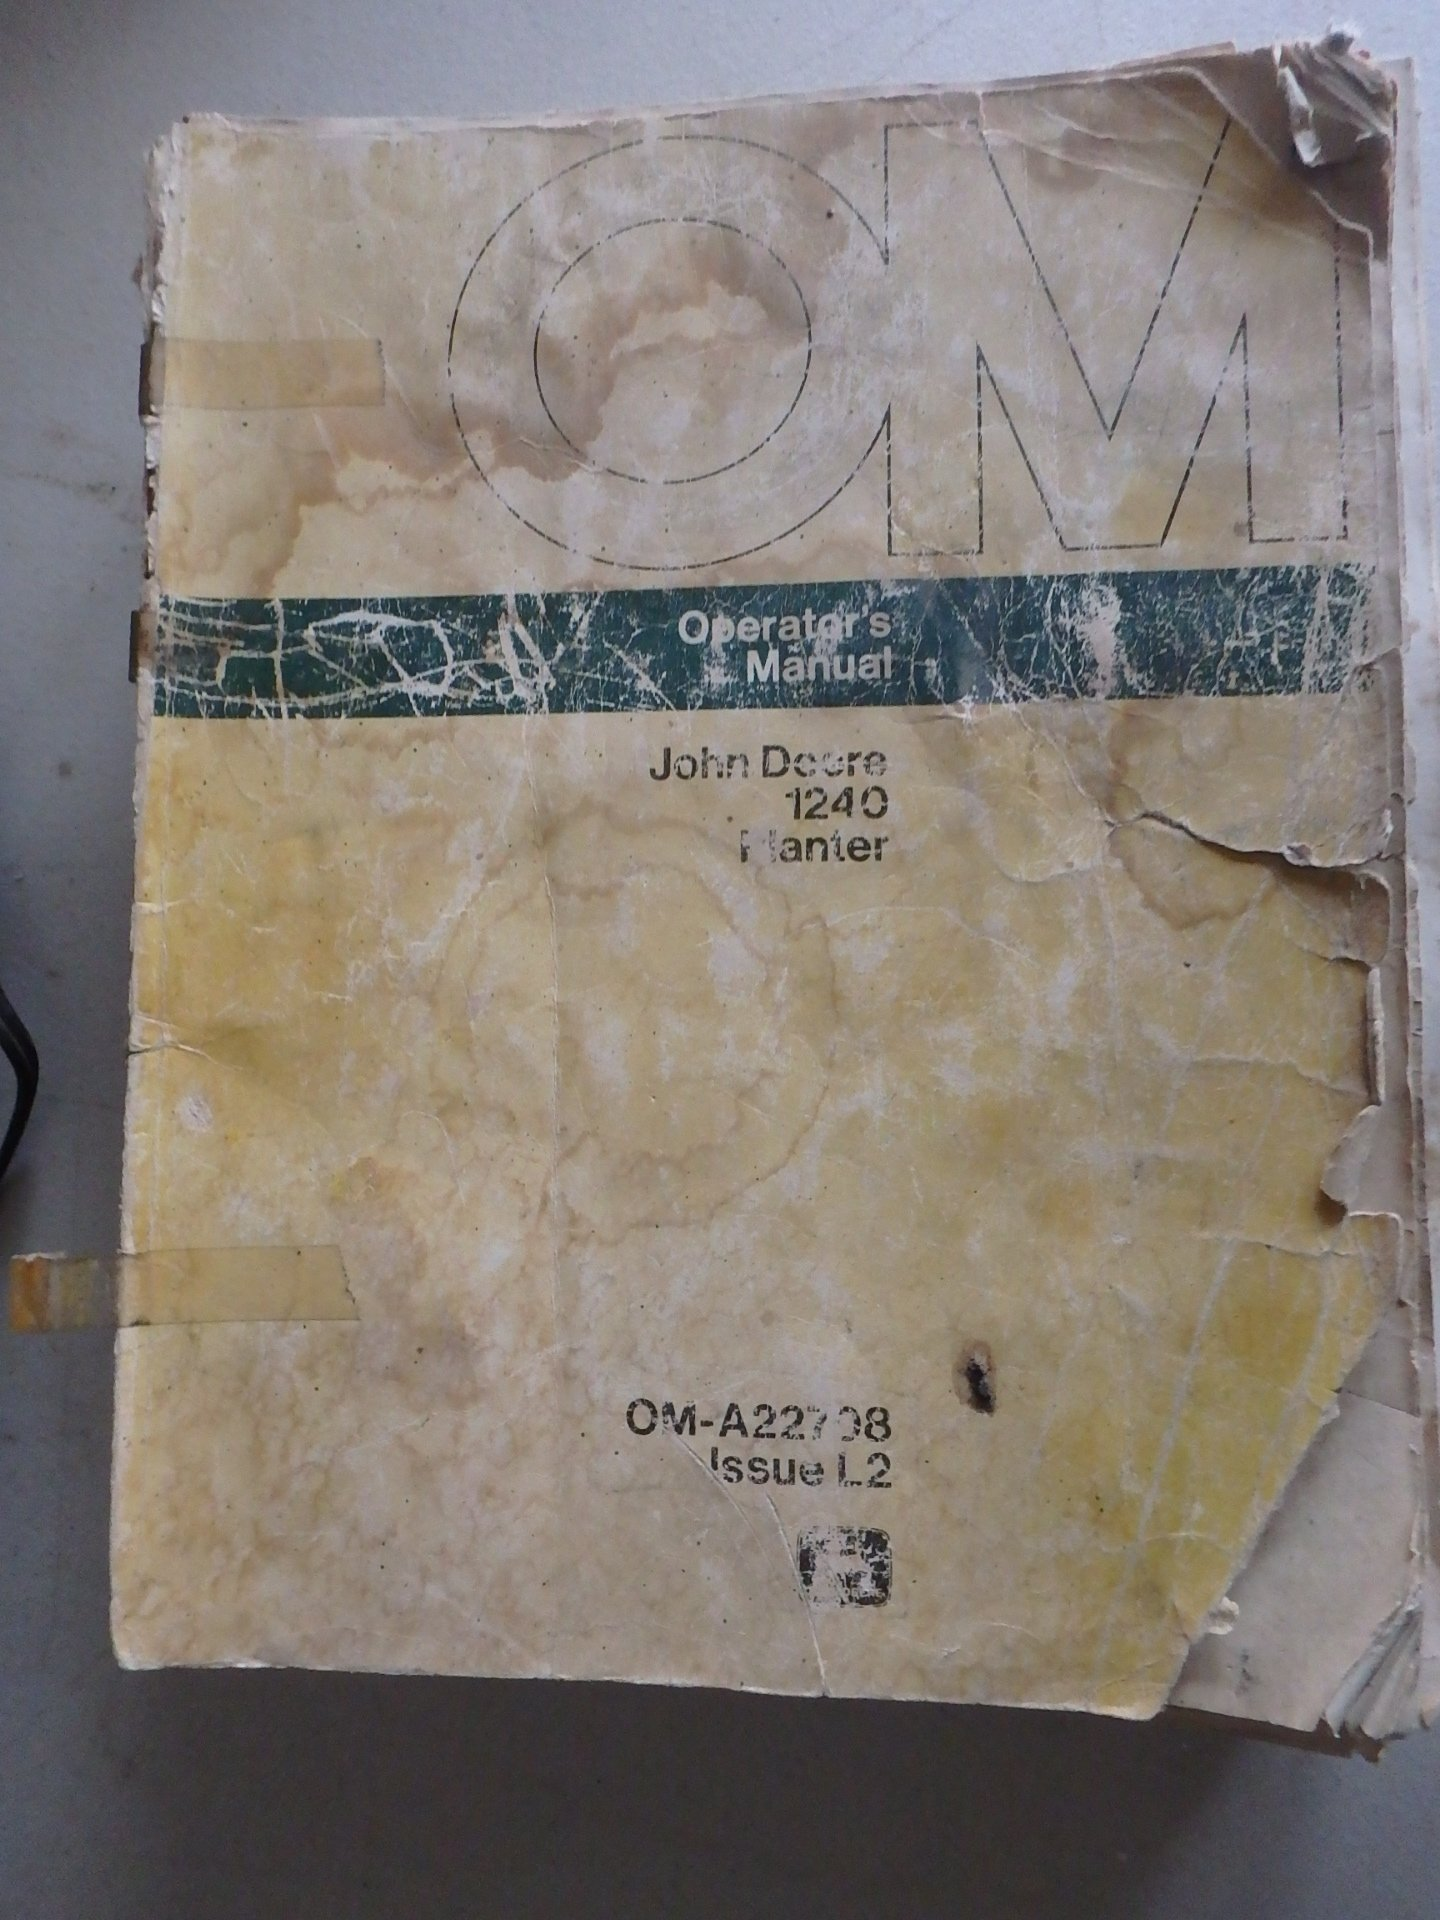 John Deere 1240 Planter Oem Operators Manual John Deere Amazon Com